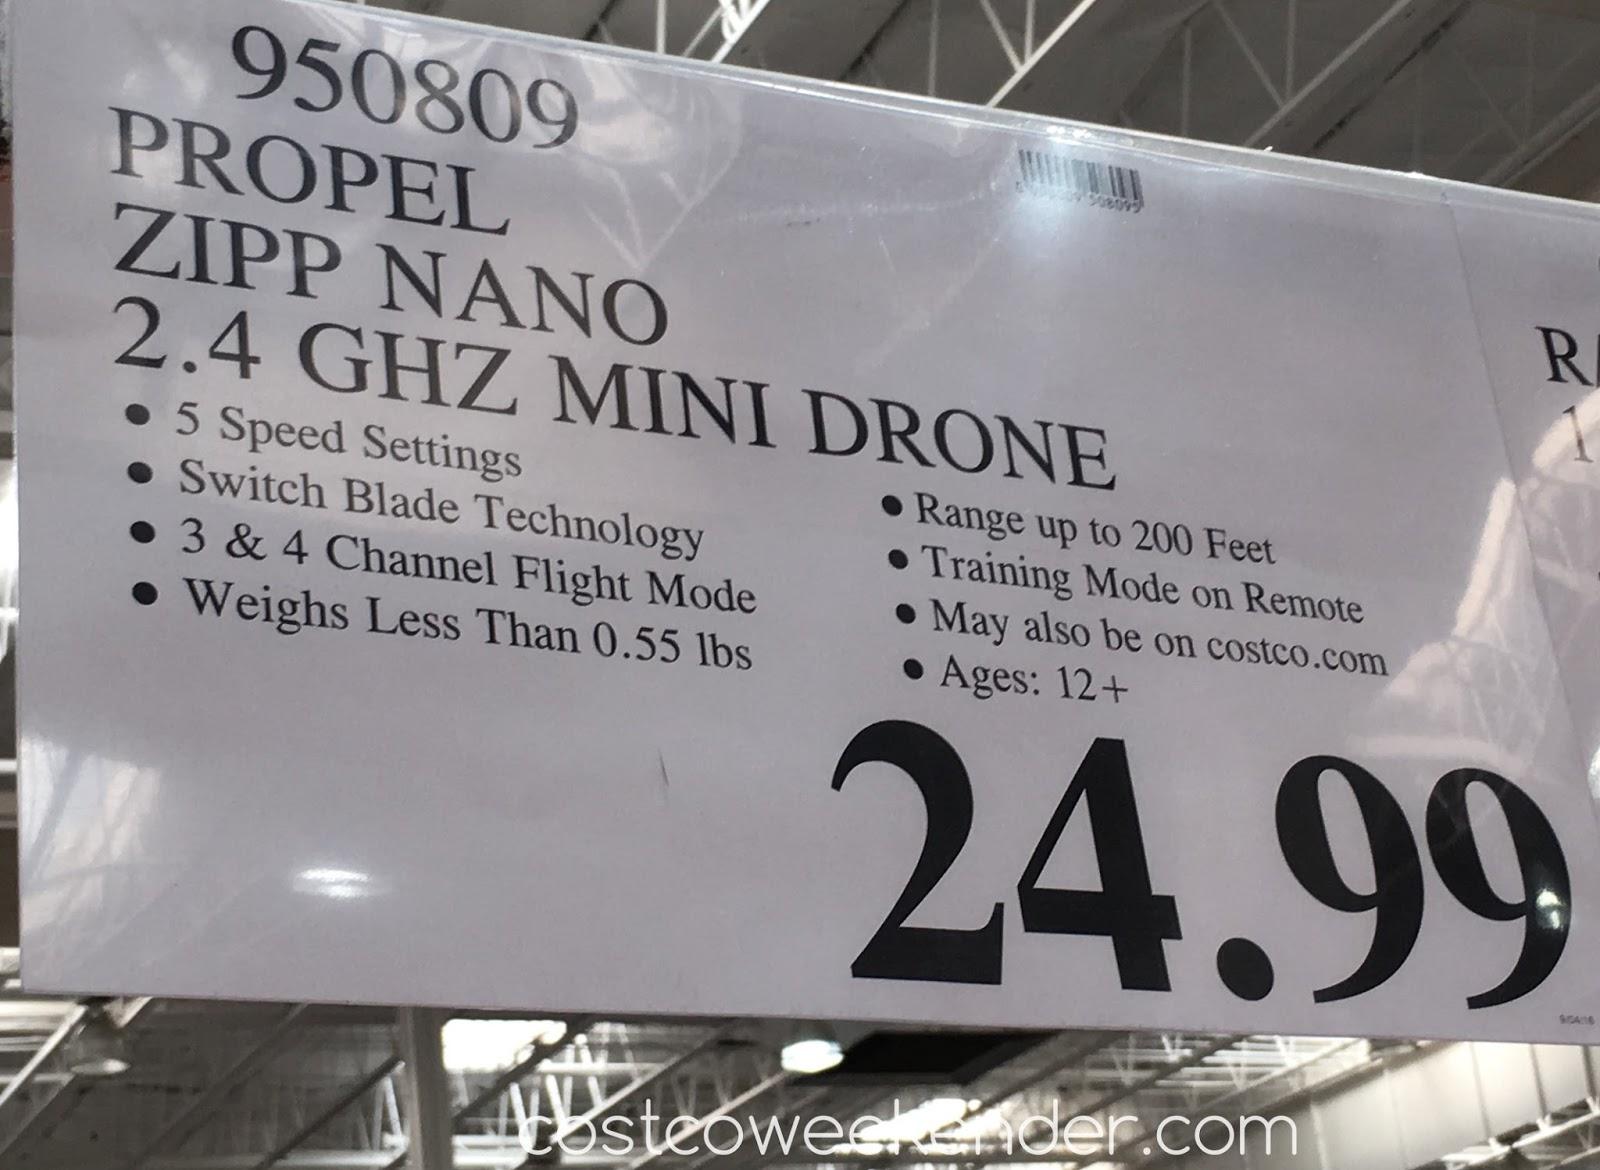 zipp nano 2.0 manual